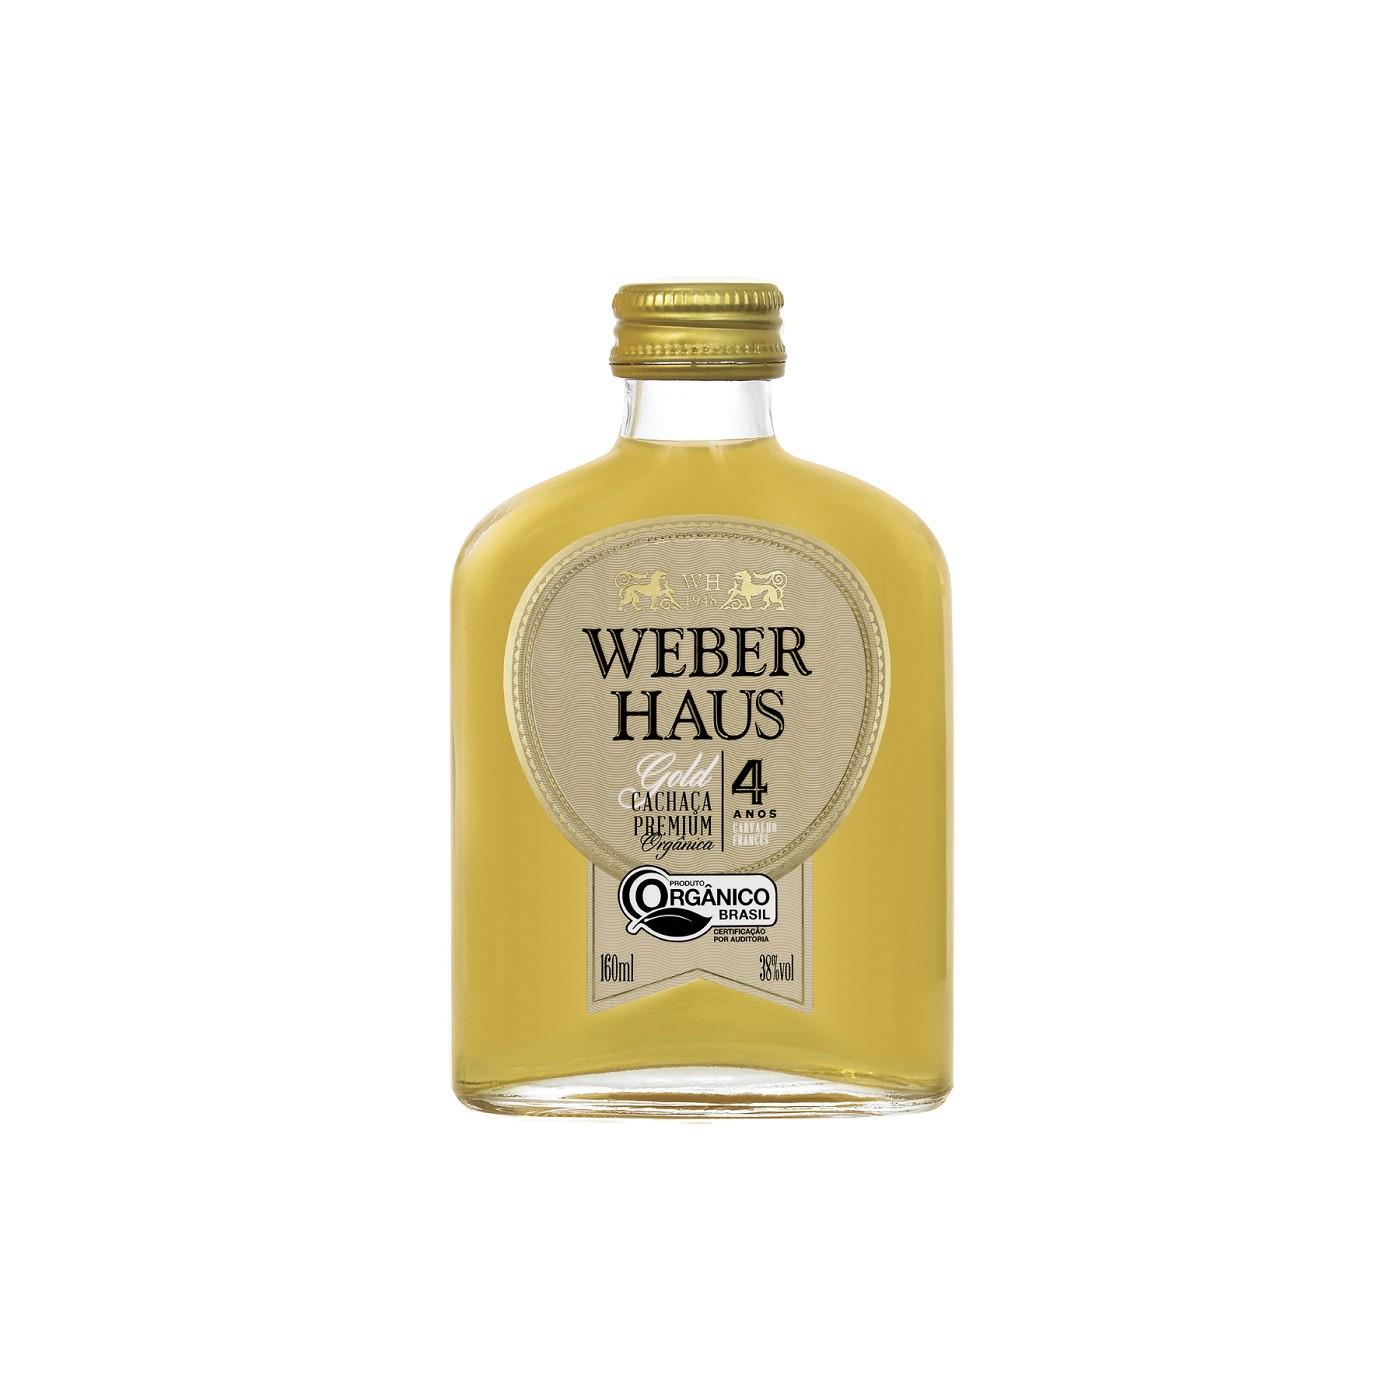 Cachaça Premium Gold 4 Anos Weber Haus - 160ml